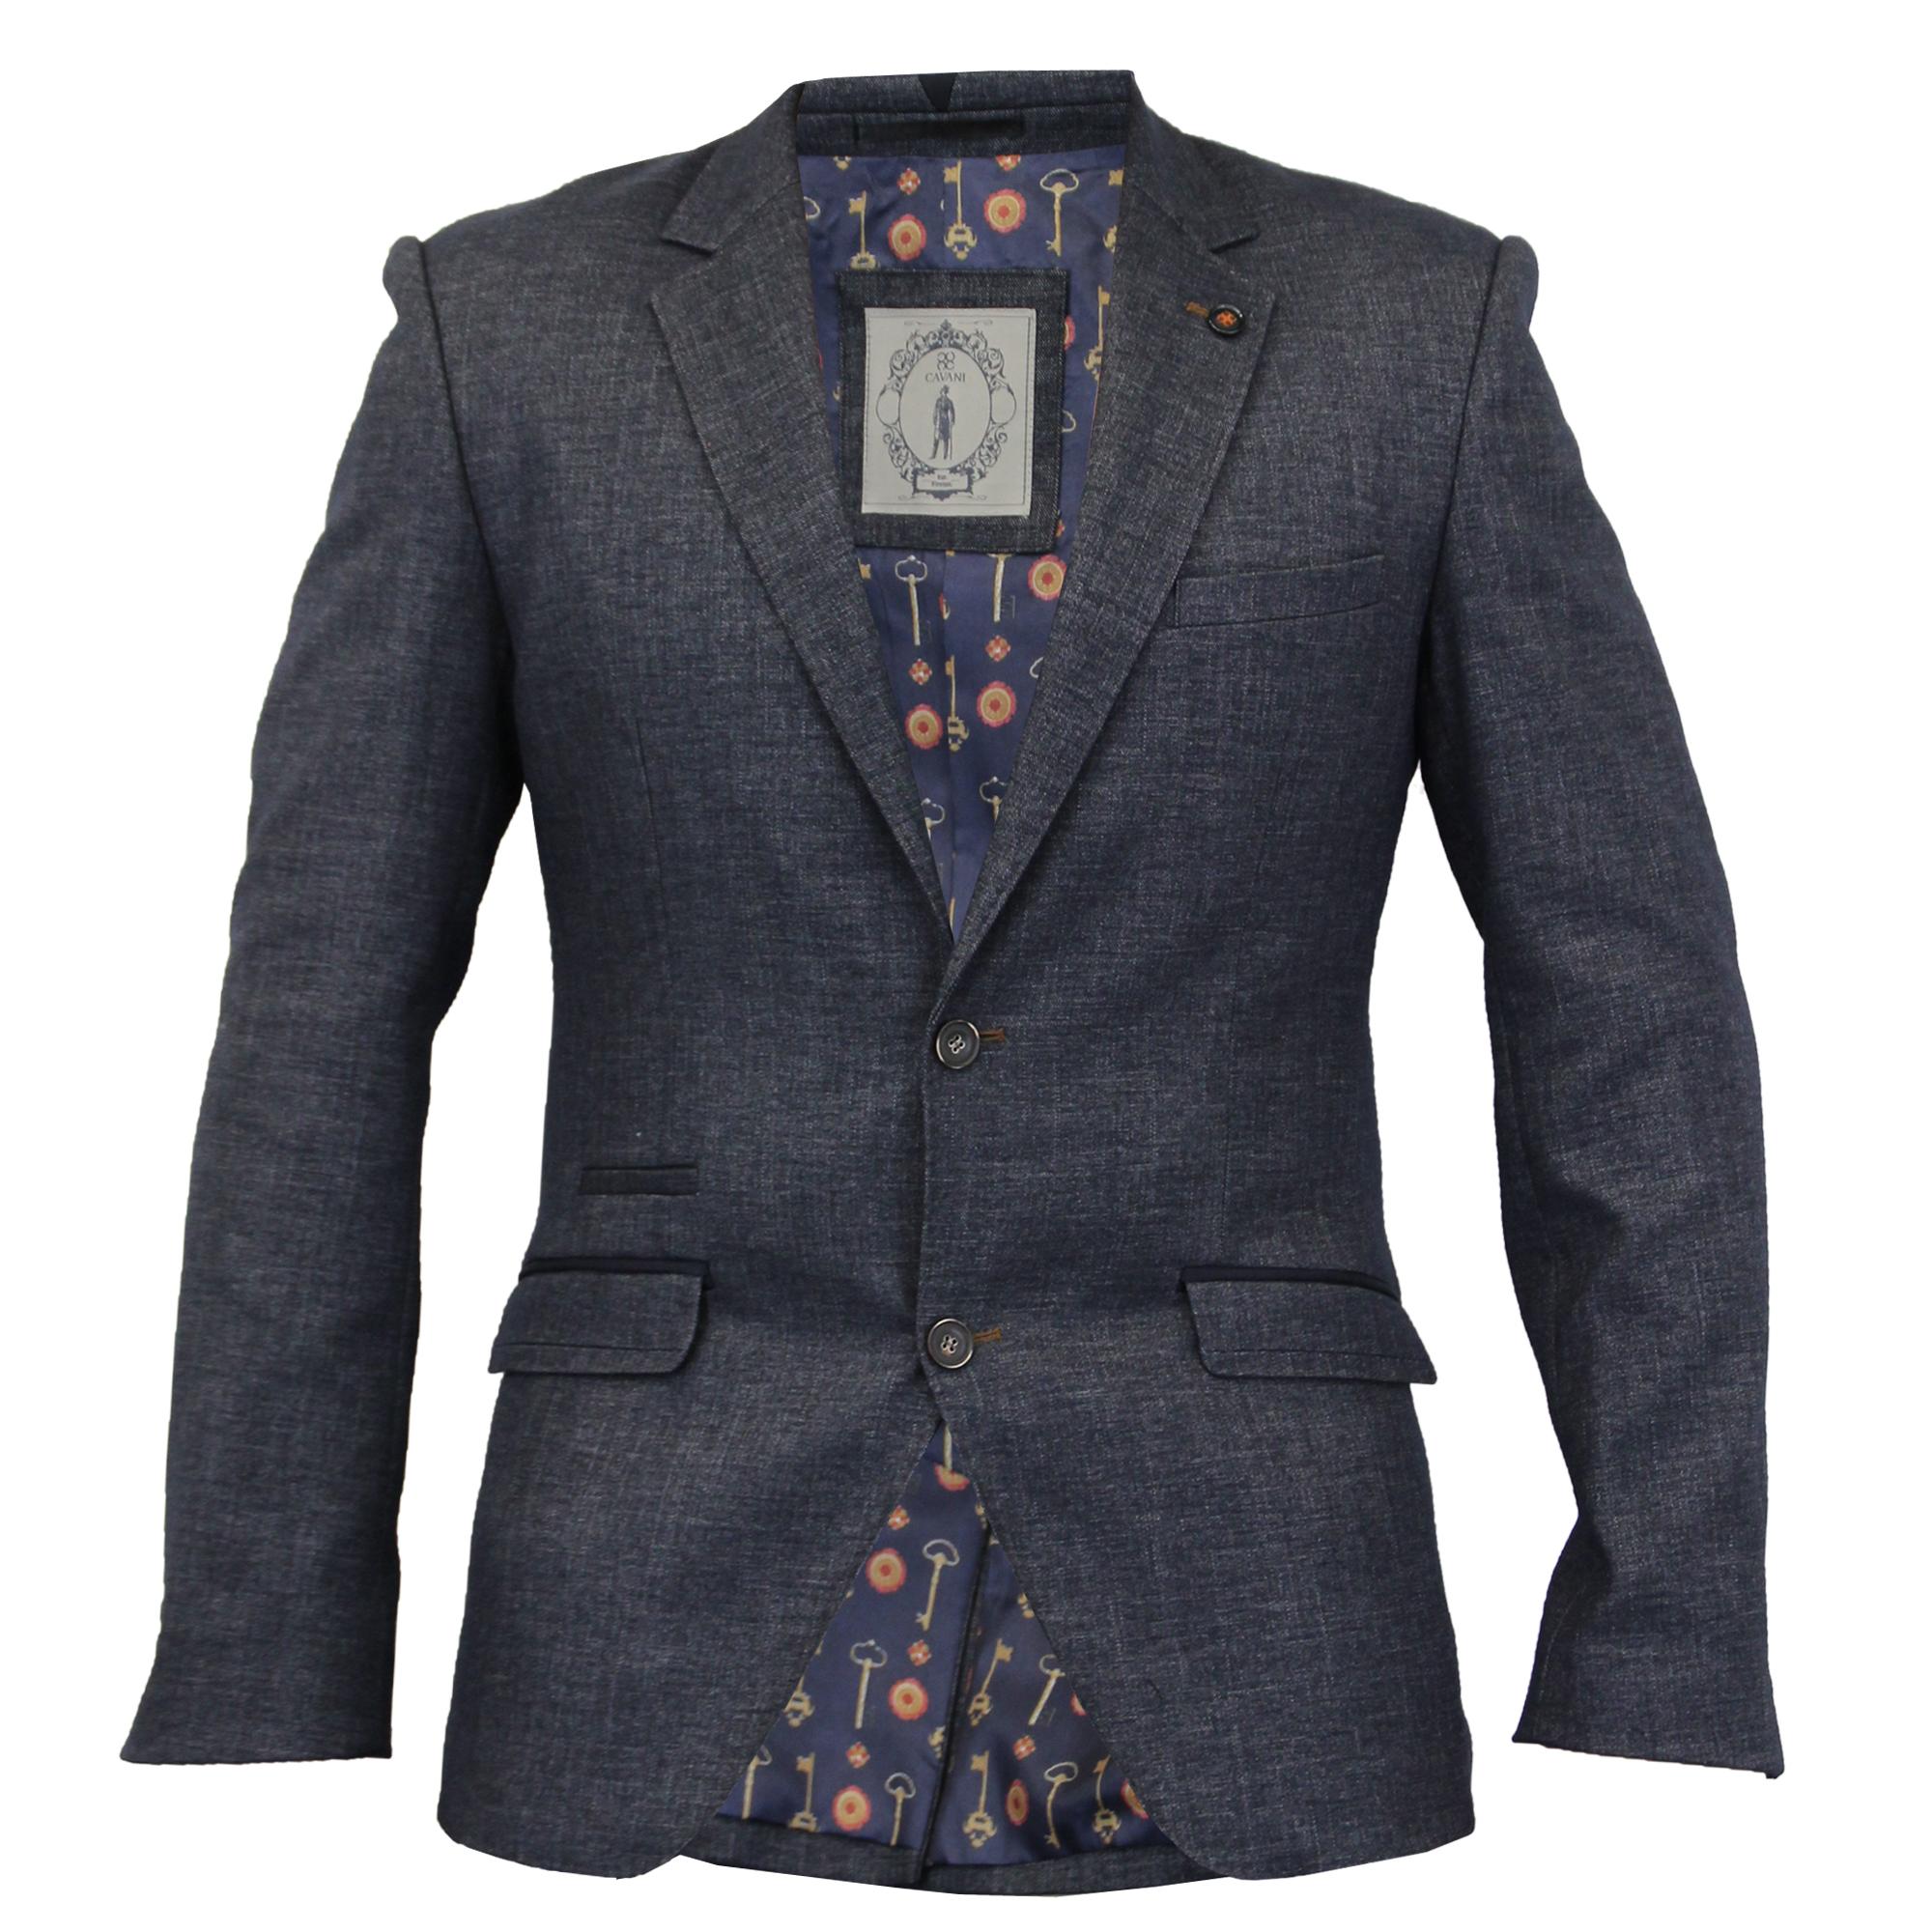 MEN TWEED JACKET $ View All; Wool Flannel. please SIGN IN/REGISTER. MEN WOOL FLANNEL SLIM-FIT JACKET $ View All; Stretch Wool. please SIGN IN/REGISTER. Low Stock. MEN STRETCH WOOL SLIM-FIT JACKET $ Outerwear and Blazers BLOCKTECH Ultra Light Down Puffer Down Fleece Jackets Coats.